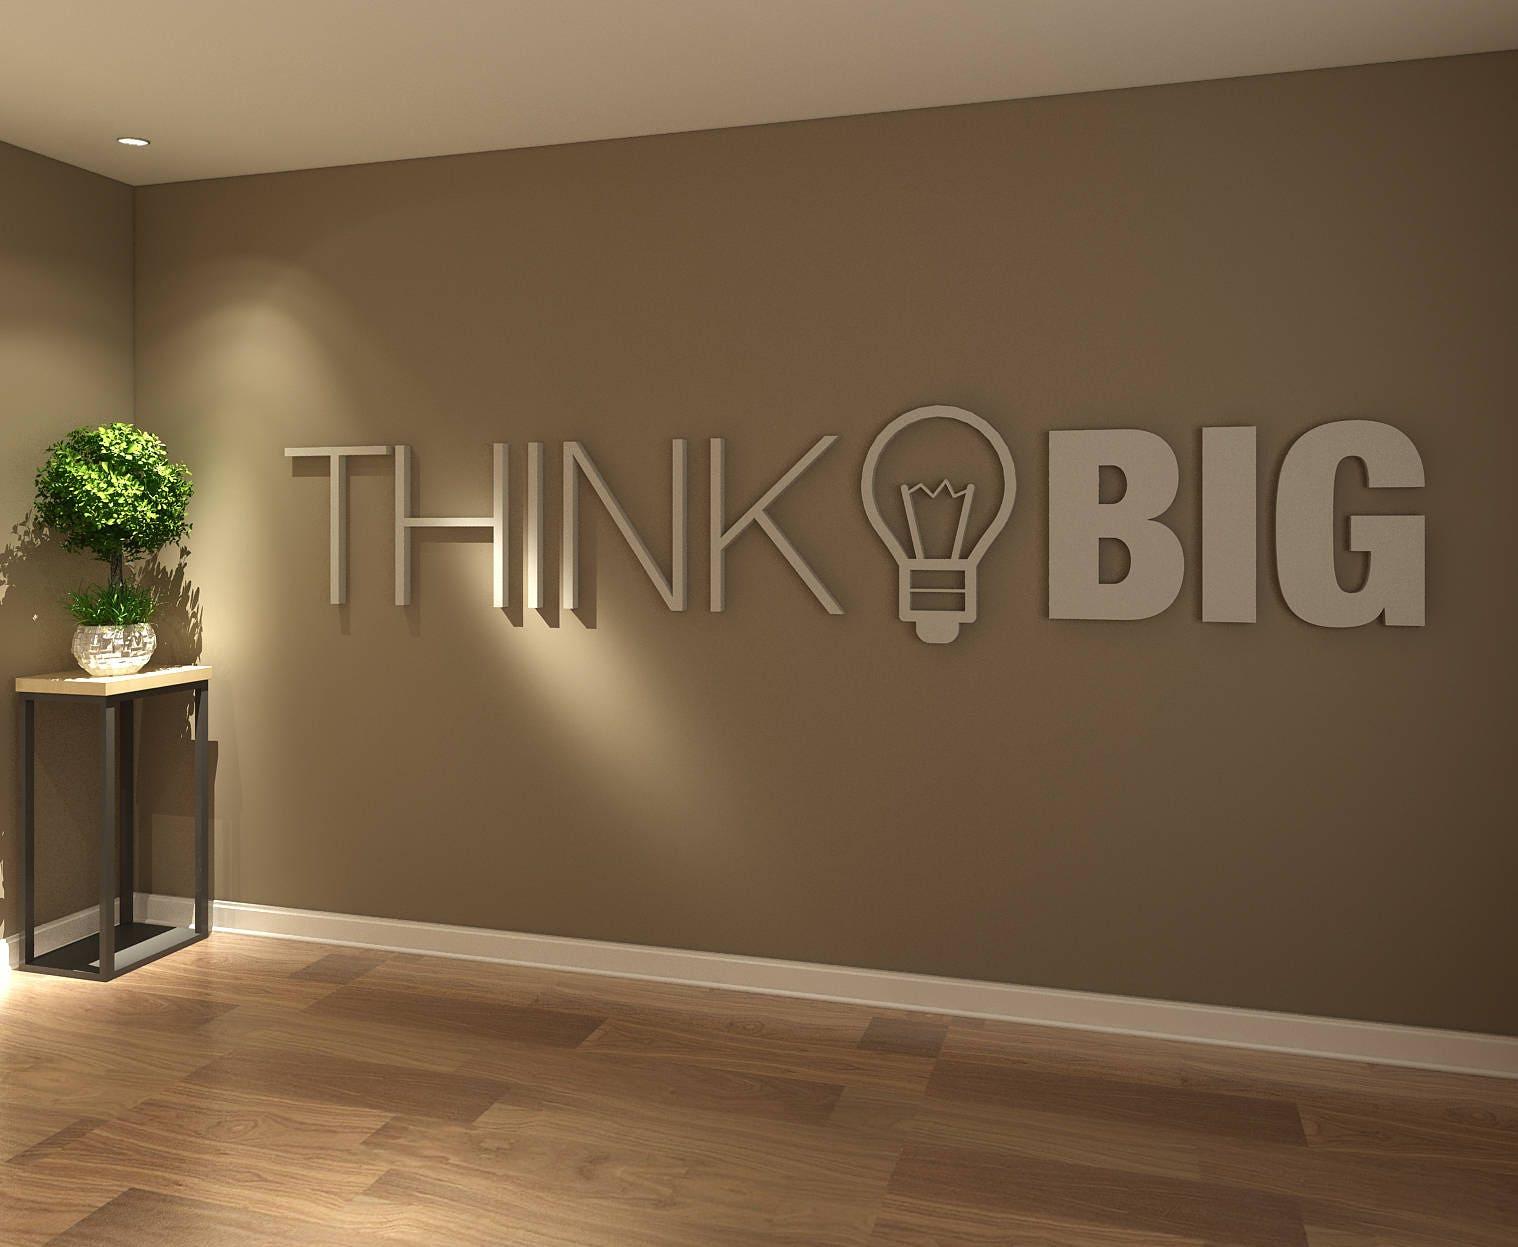 think big office wall art decor 3d pvc typography etsy. Black Bedroom Furniture Sets. Home Design Ideas